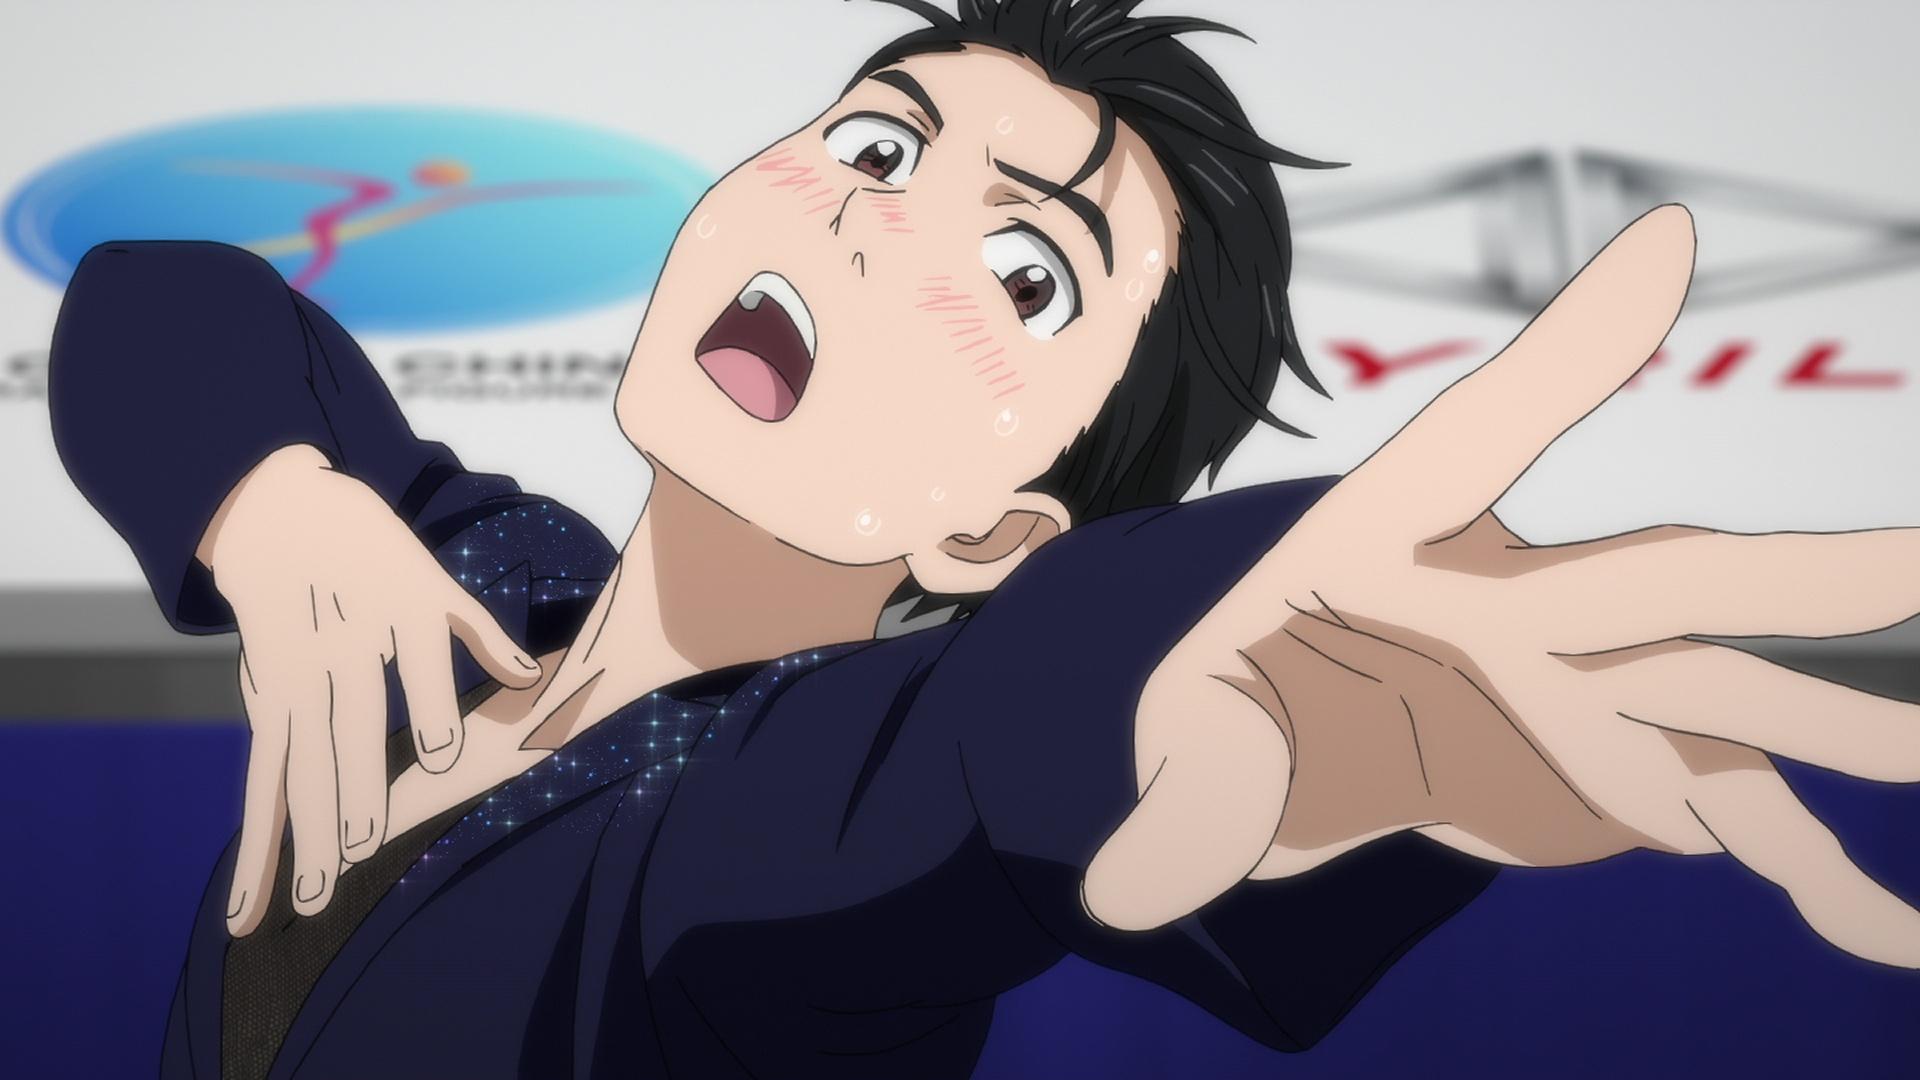 Watch Yuri!!! on ICE Season 1 Episode 7 Dub | Anime